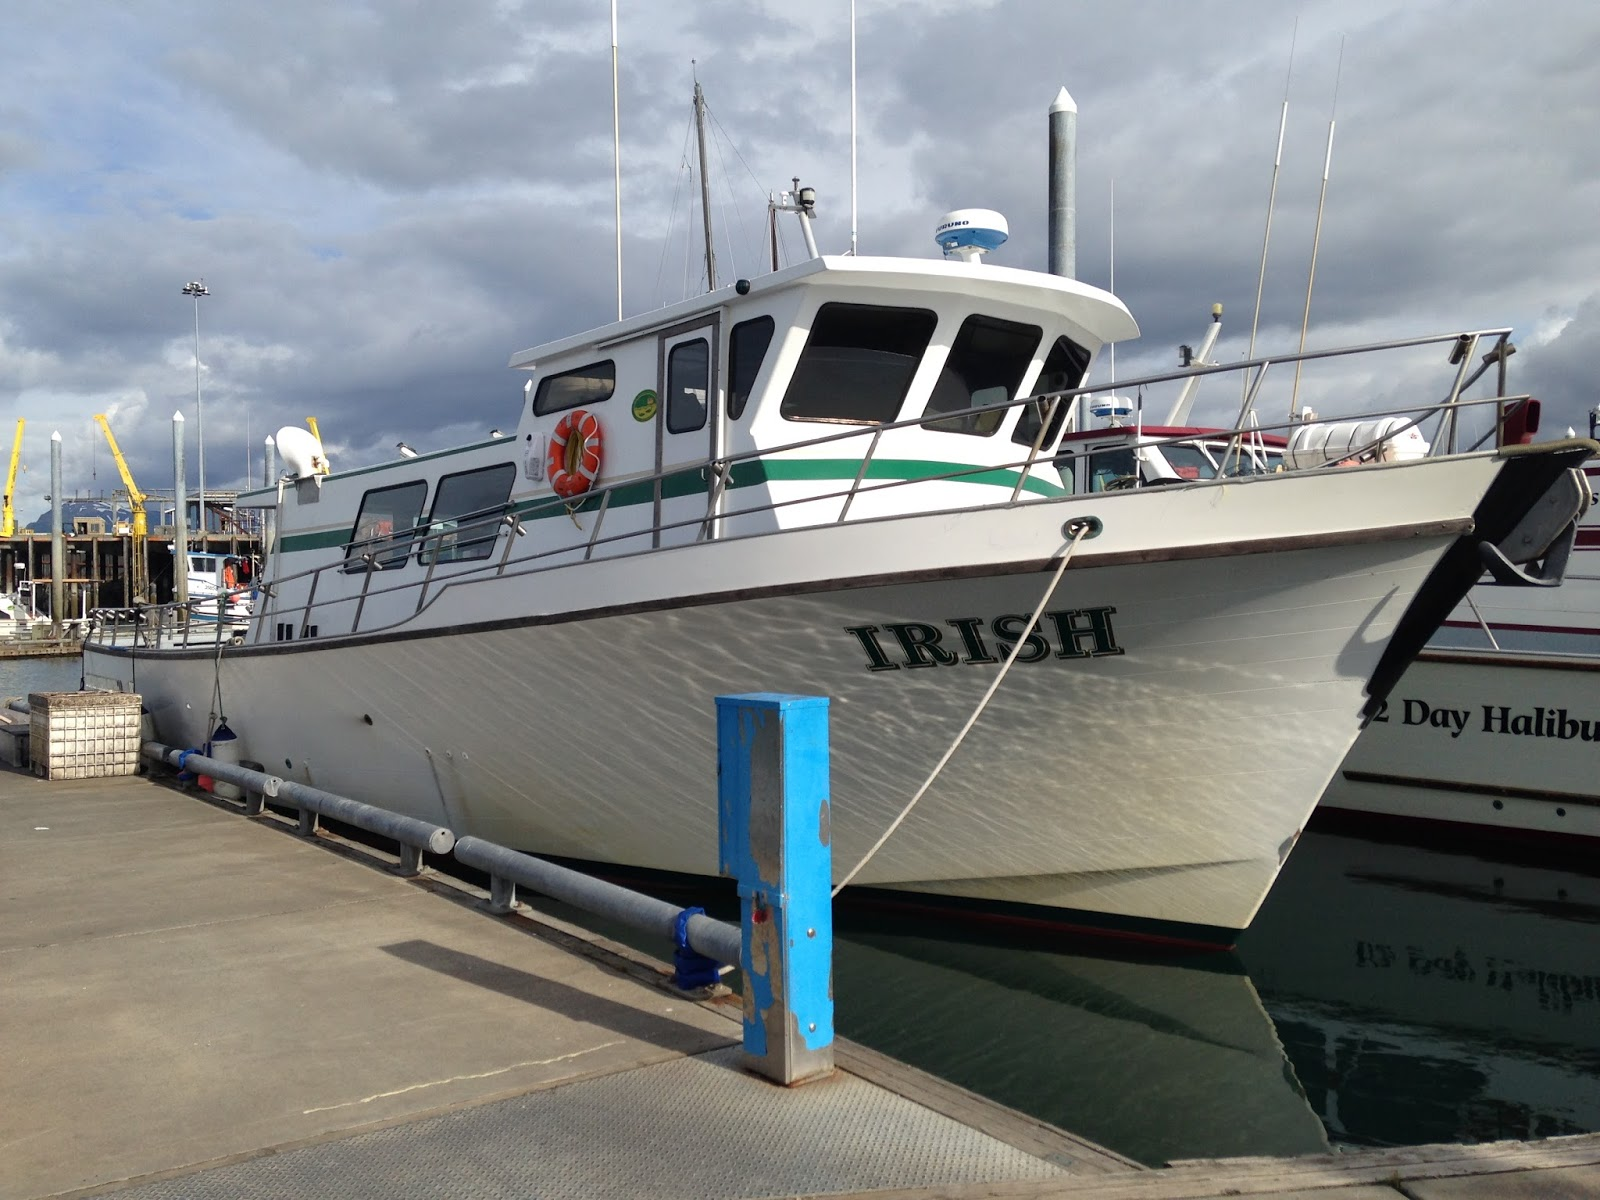 meng's travels: halibut fishing